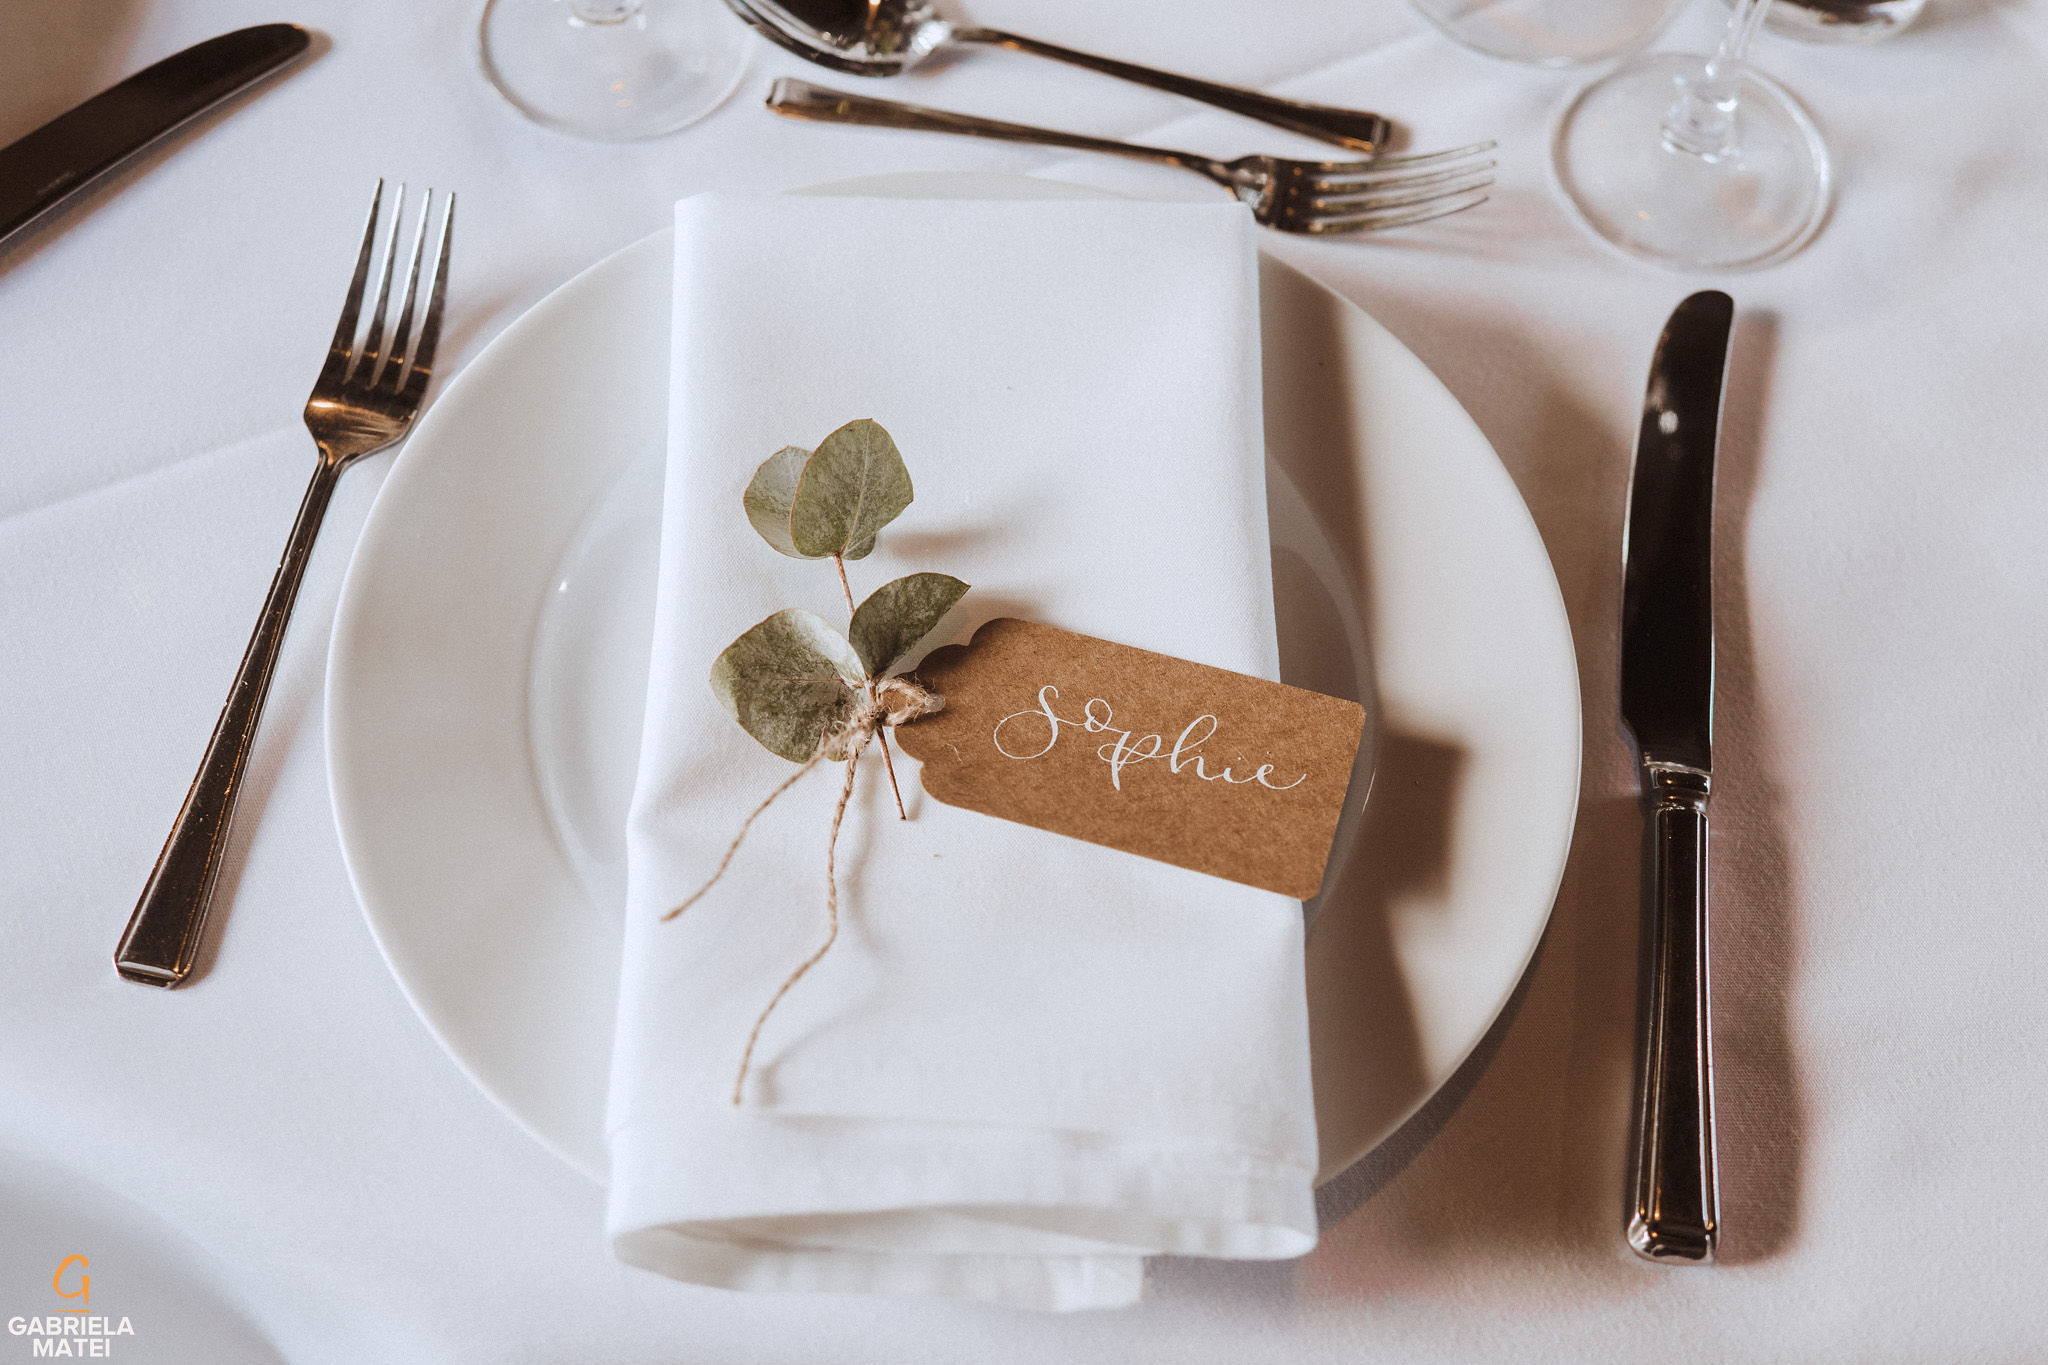 Name tag wedding details at South Stoke Barn wedding venue in Arundel